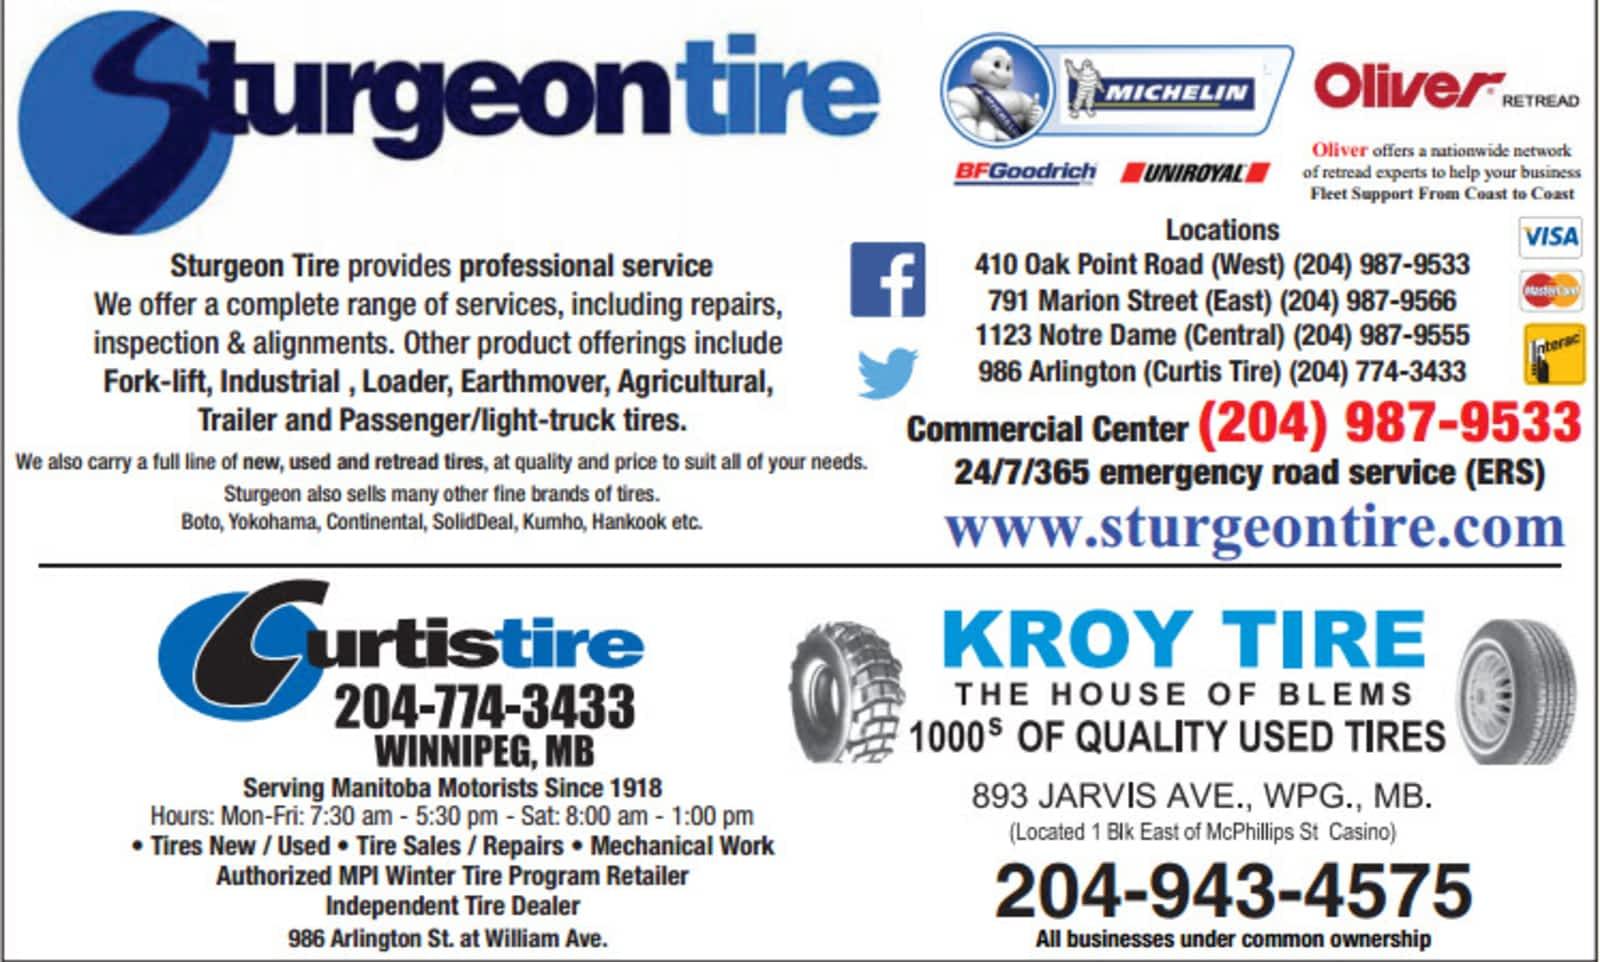 Used Tires Winnipeg >> Kroy Tire Opening Hours 893 Jarvis Ave Winnipeg Mb